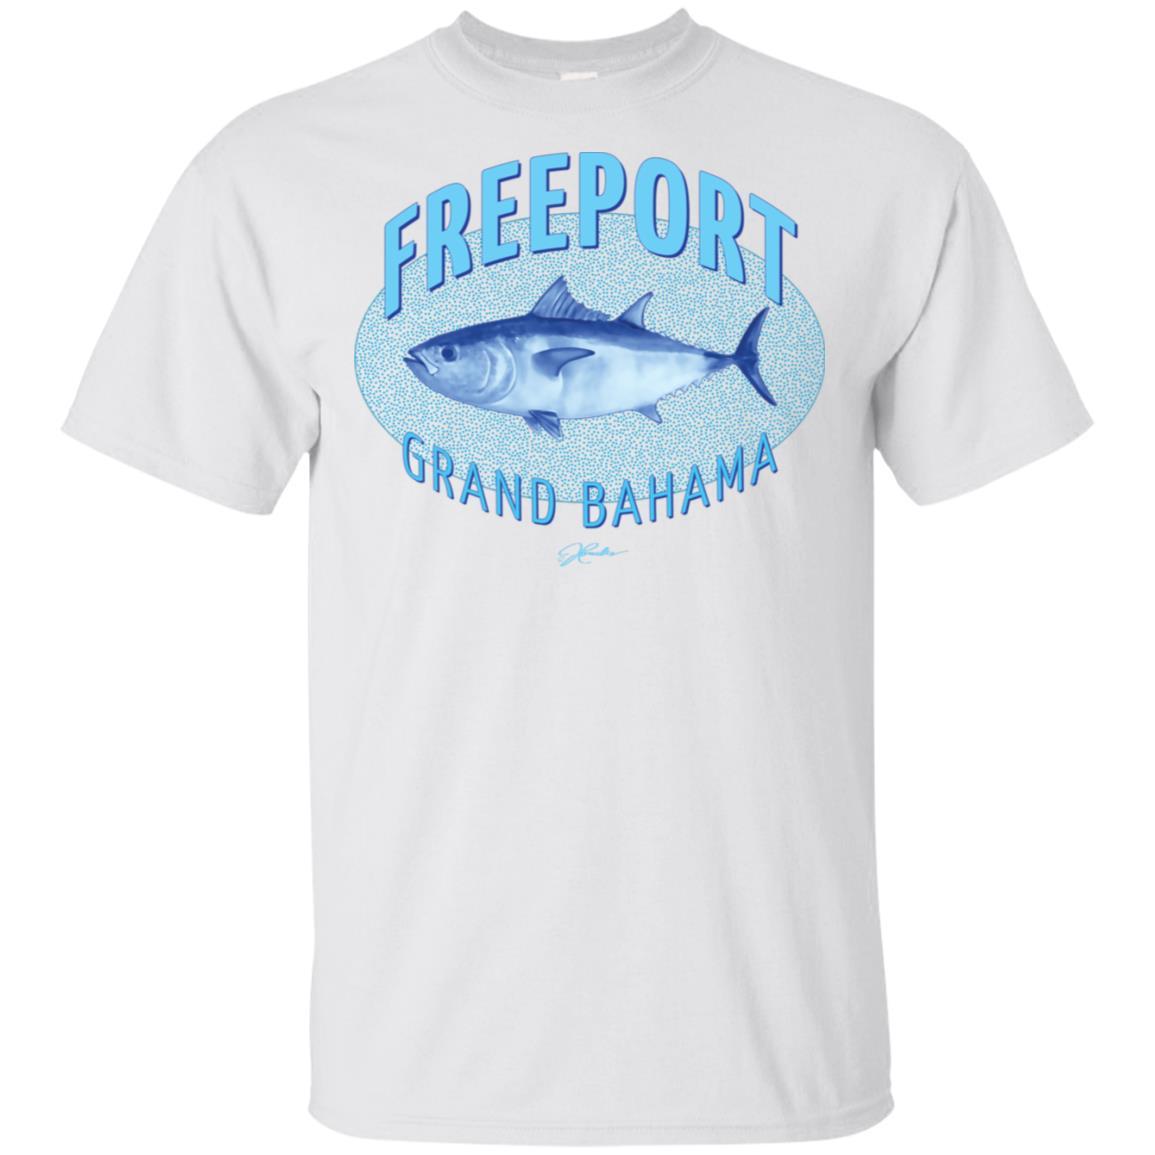 JCombs Freeport, Grand Bahama, Bluefin Tuna Unisex Short Sleeve